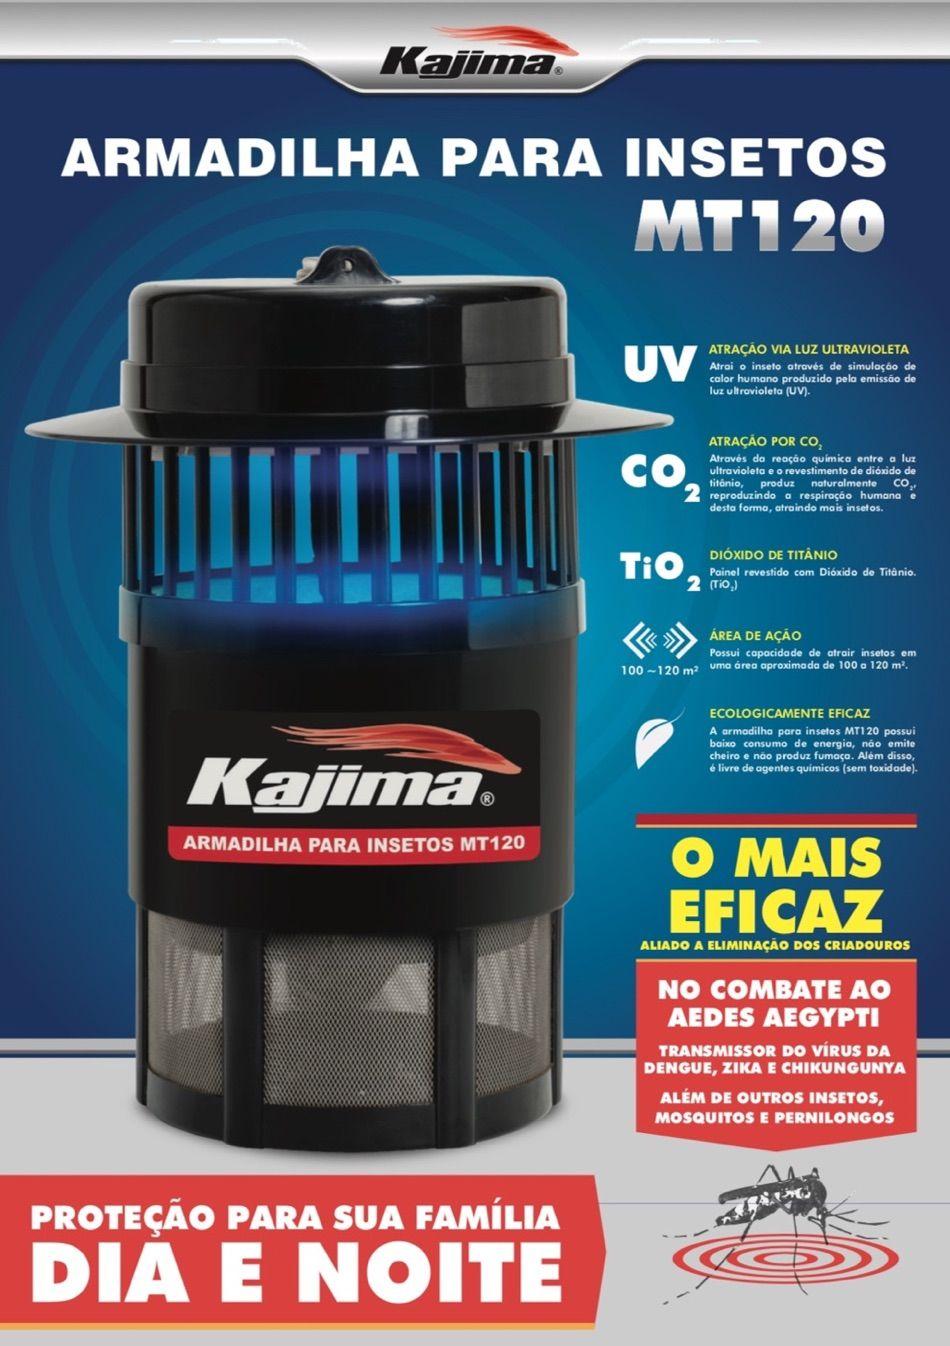 Armadilha Insetos Kajima MT120